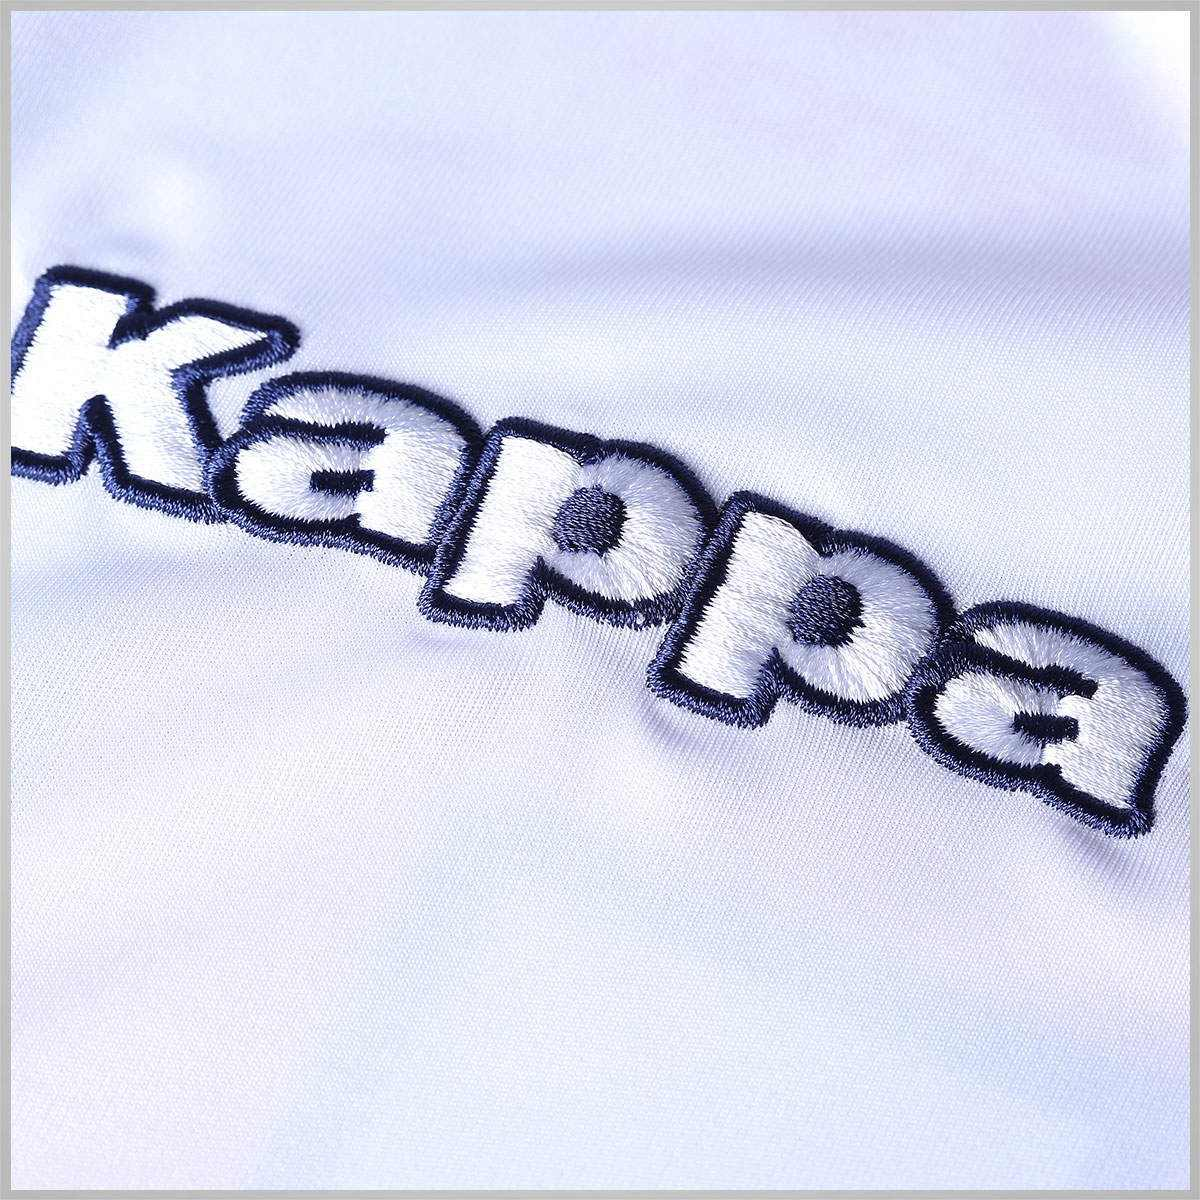 camisa fortaleza kappa oficial 2016 branca. Carregando zoom. c5c8b6818925d